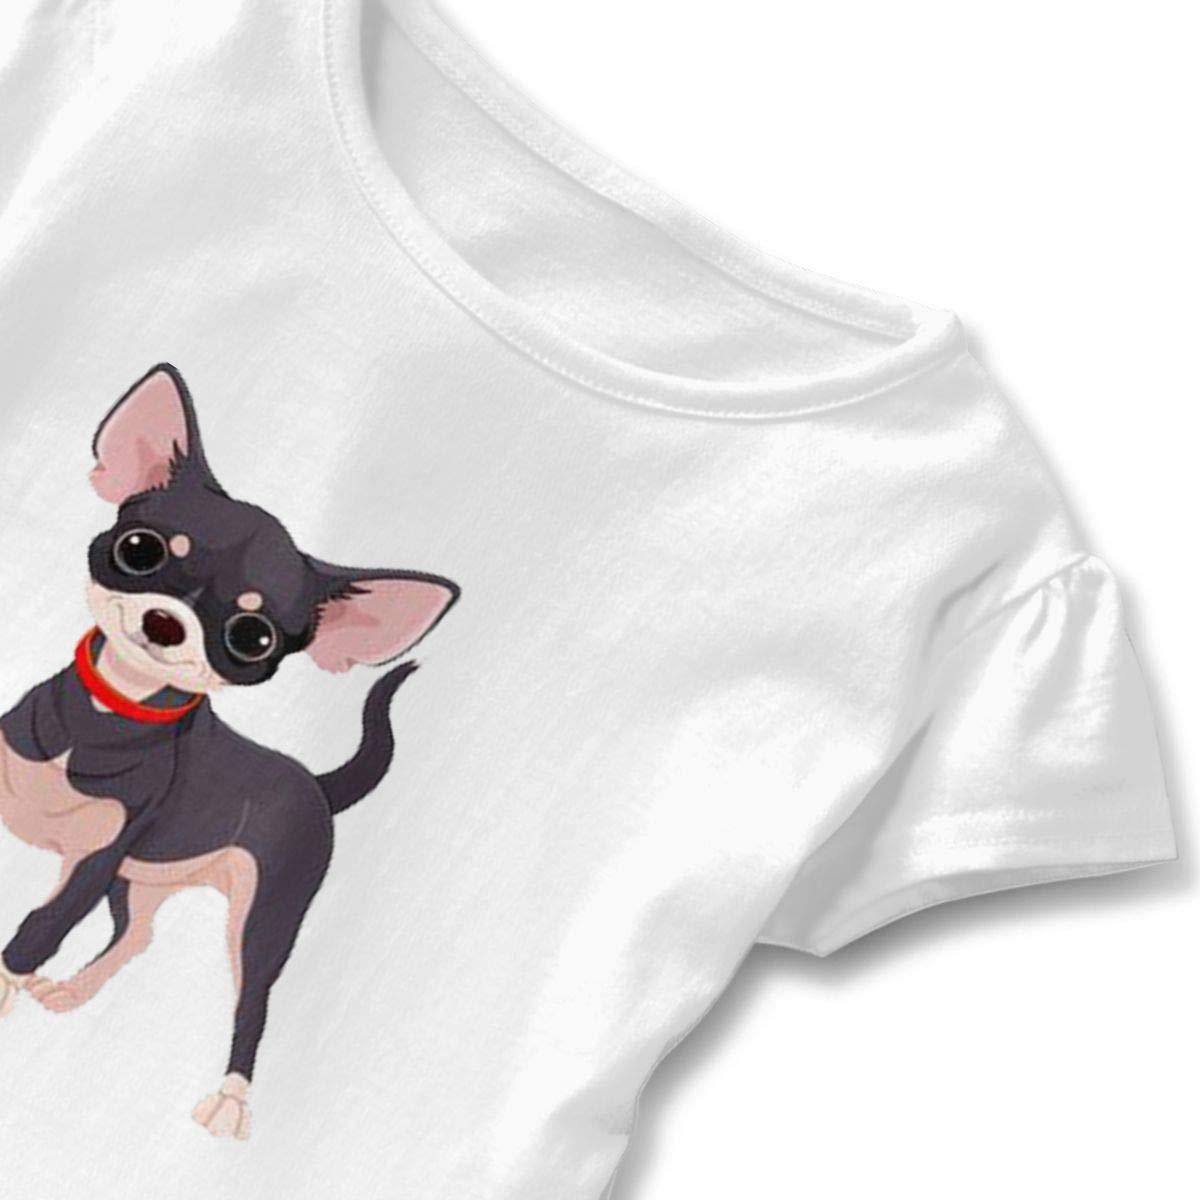 Chihuahua Dog Toddler Baby Girls Cotton Ruffle Short Sleeve Top Comfortable T-Shirt 2-6T